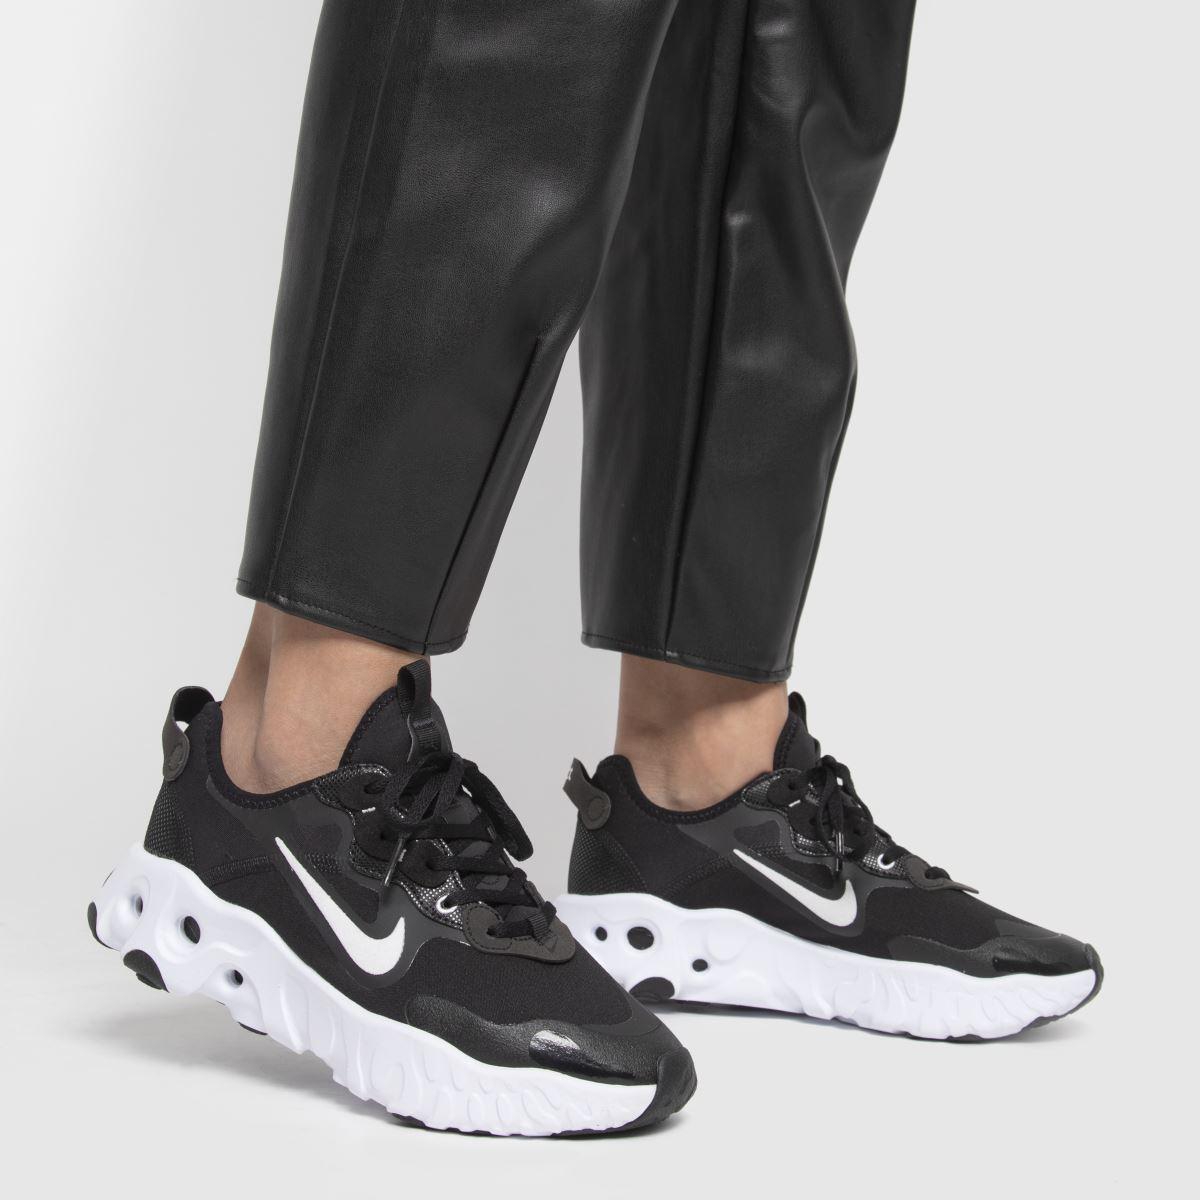 Womens Black & White Nike React Art3mis Trainers | schuh